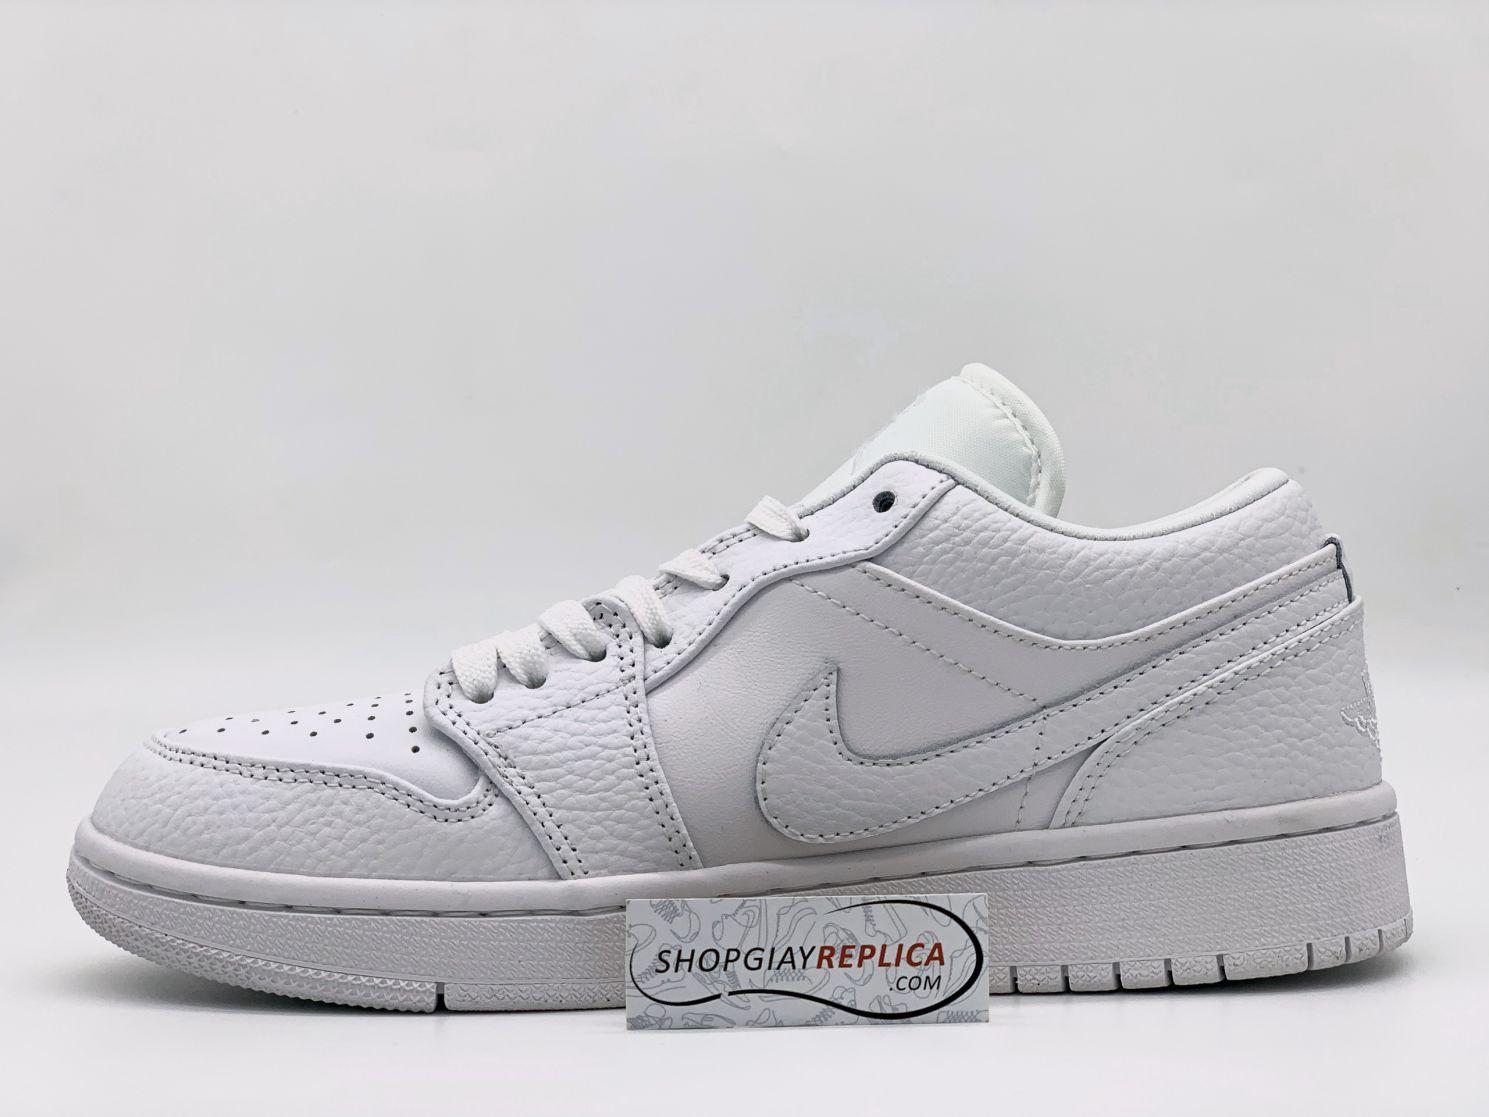 Jordan 1 white